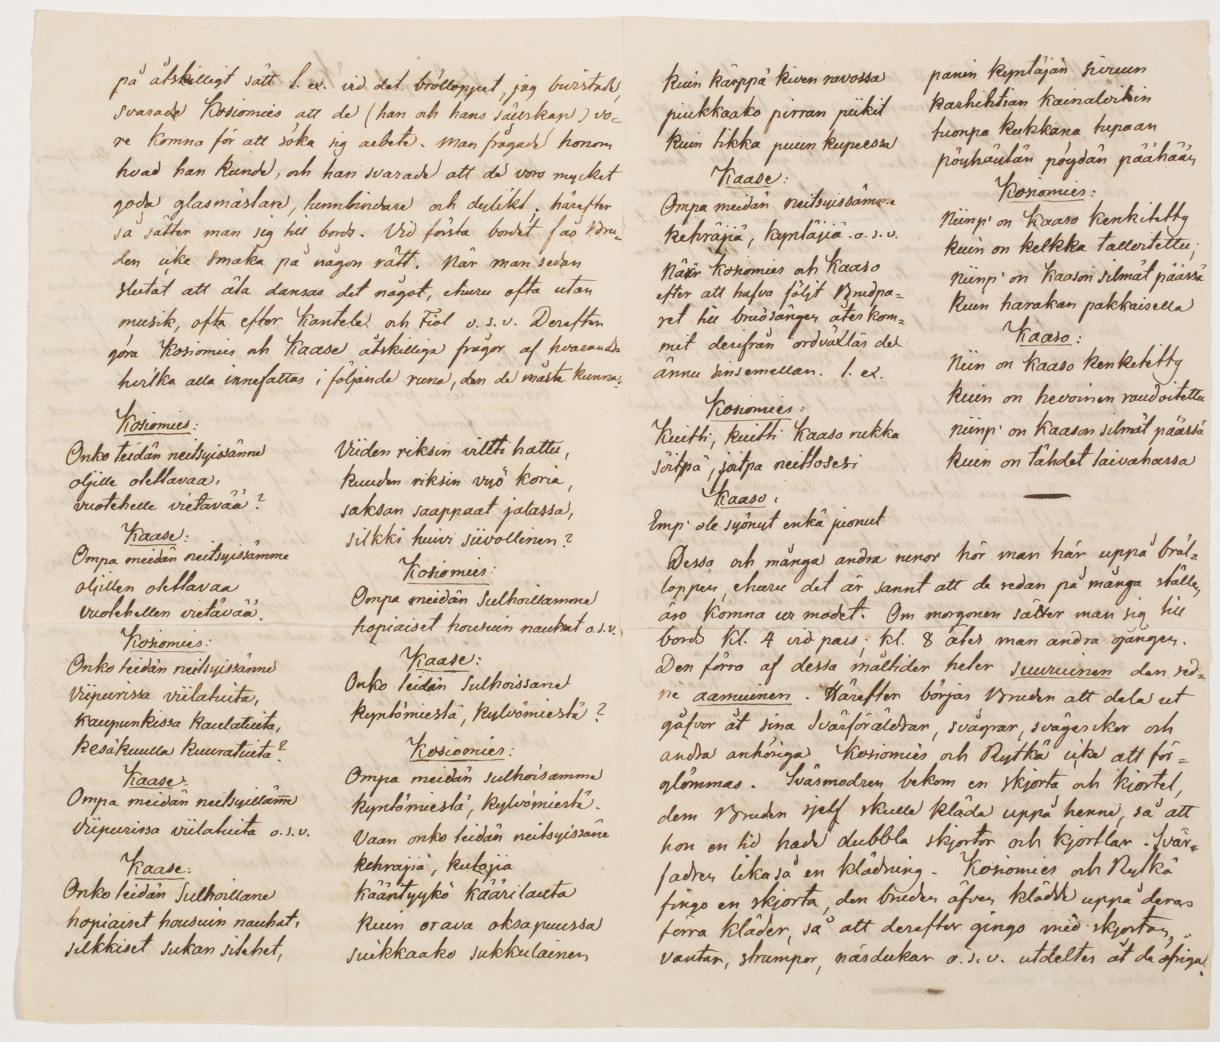 Elias Lönnrotin kirje Eva Agatha Törngrenille 8.7.1828